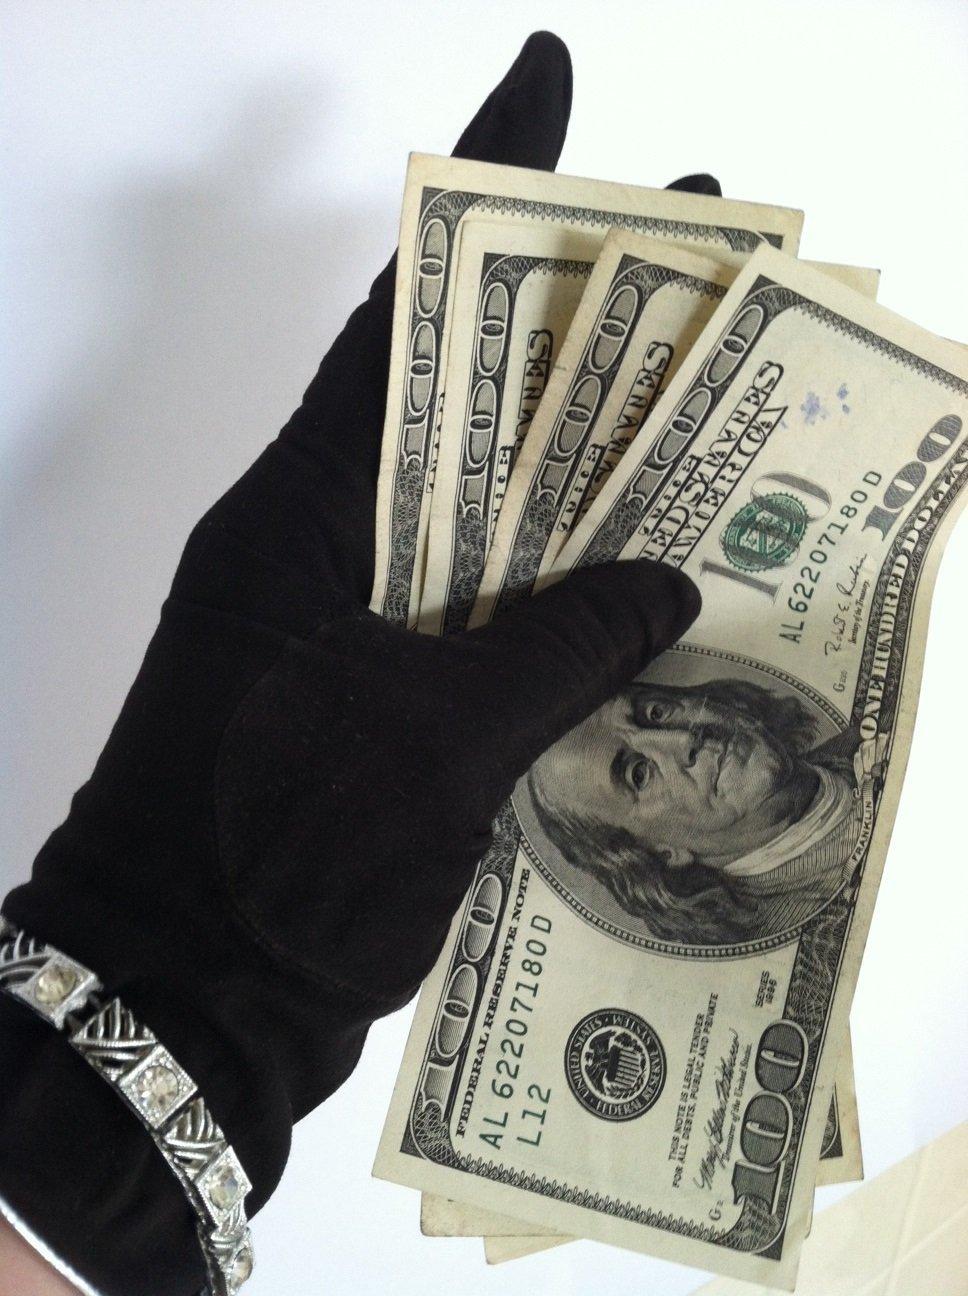 Making Her Cuckolded Piggy Bank Pay  by  Ariane Arborene